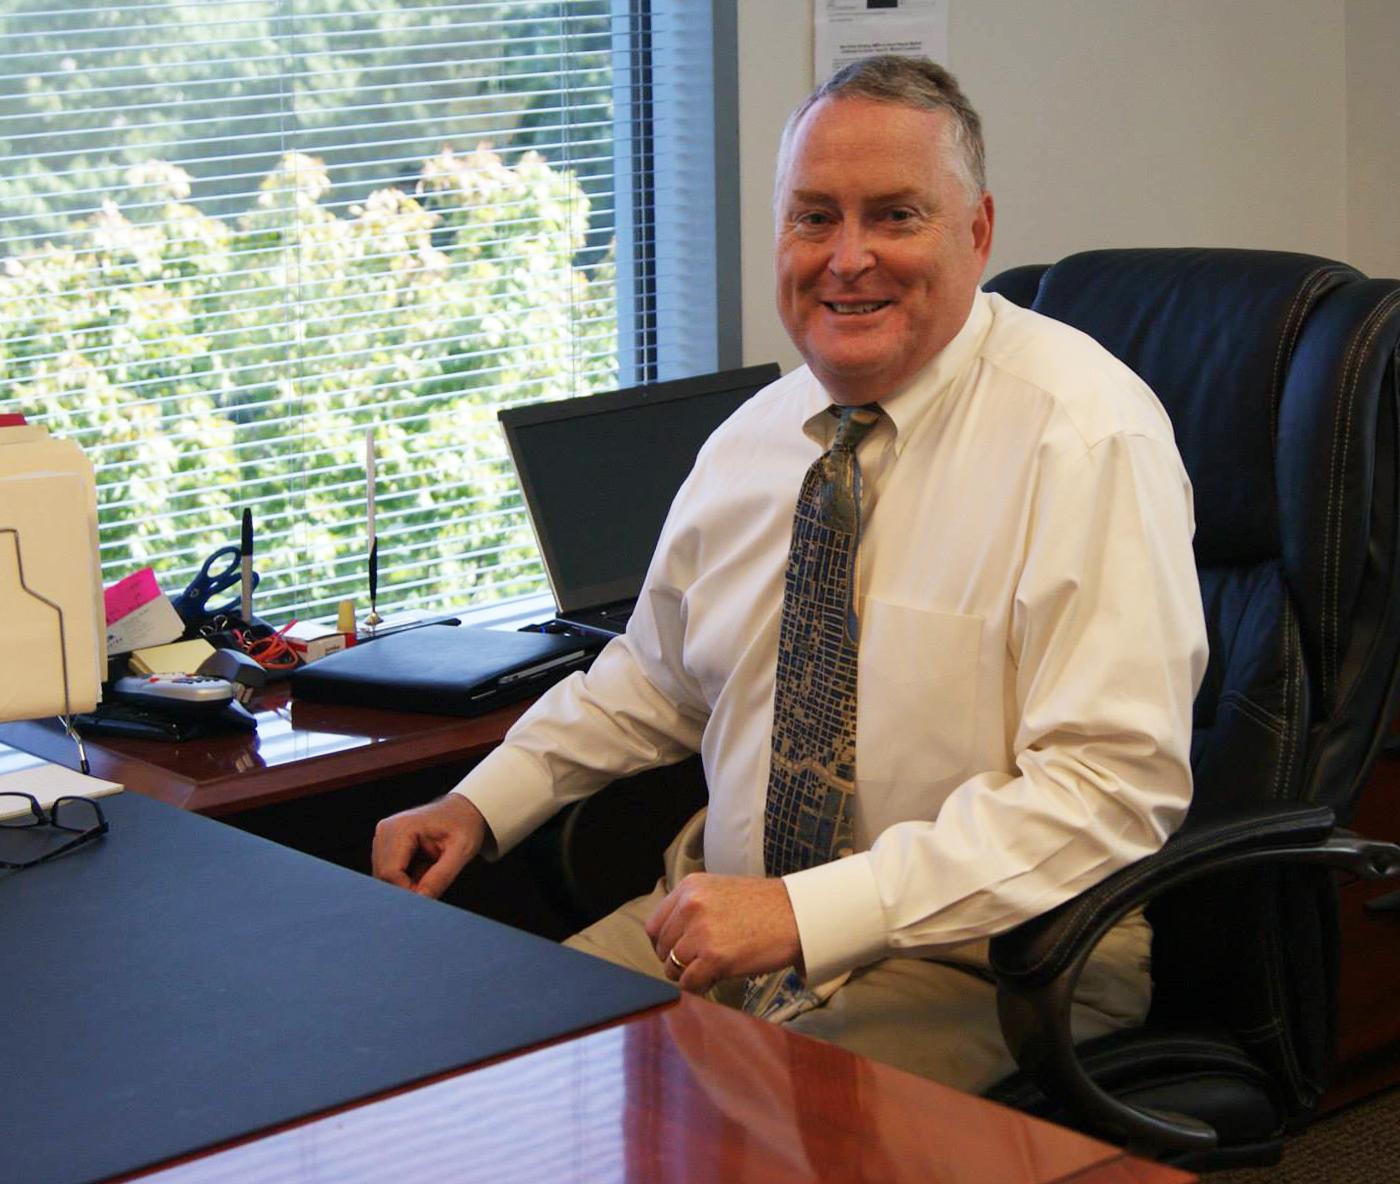 Thomas B. Faulkner, MD, MHA